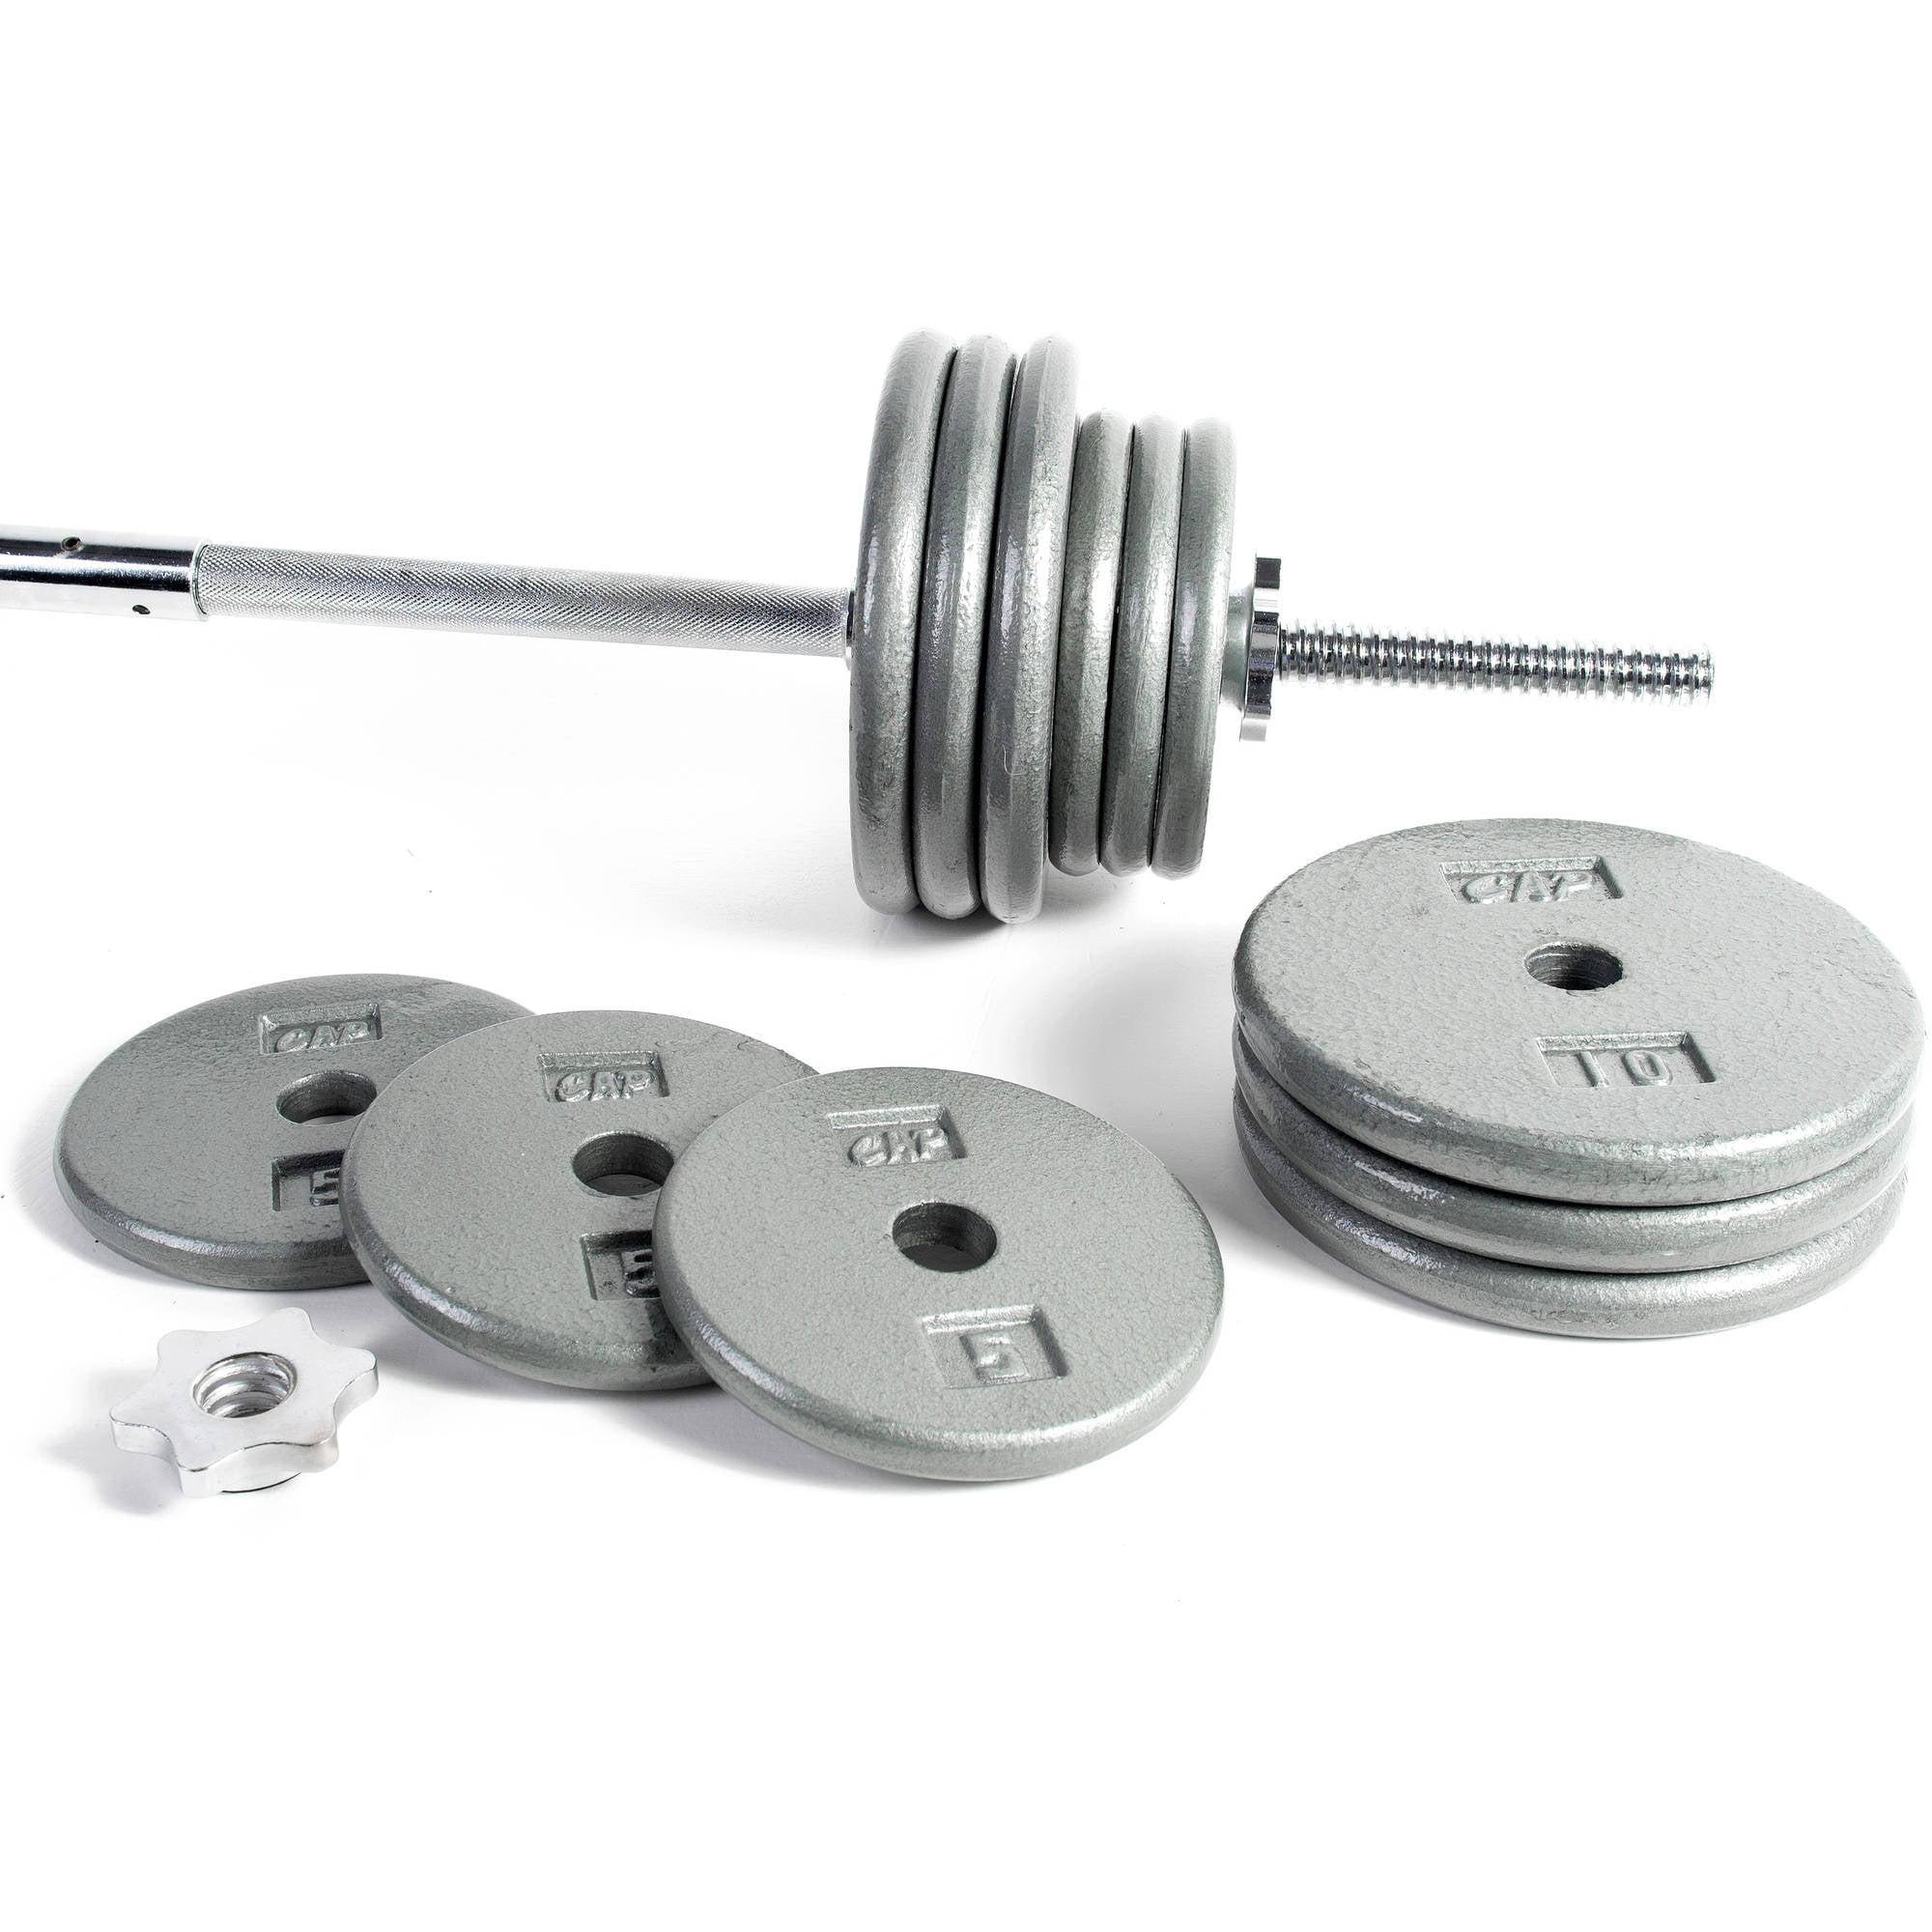 sc 1 st  Walmart & CAP Strength Deluxe Standard Bench with 100 lb Weight Set - Walmart.com